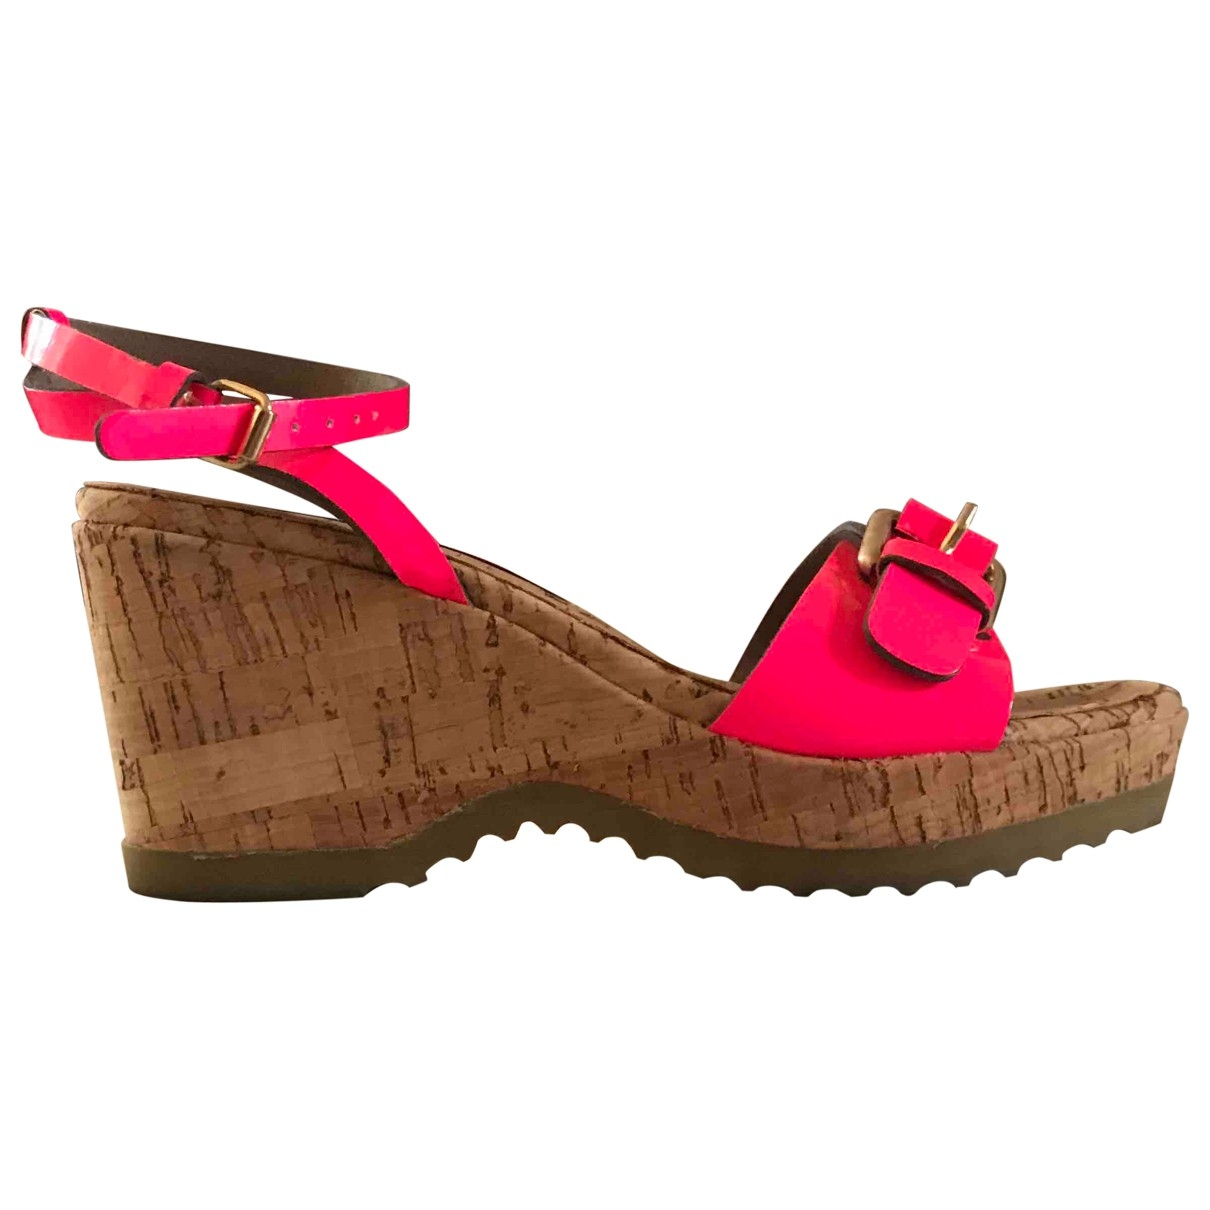 Stella Mccartney \N Pink Patent leather Sandals for Women 35 EU